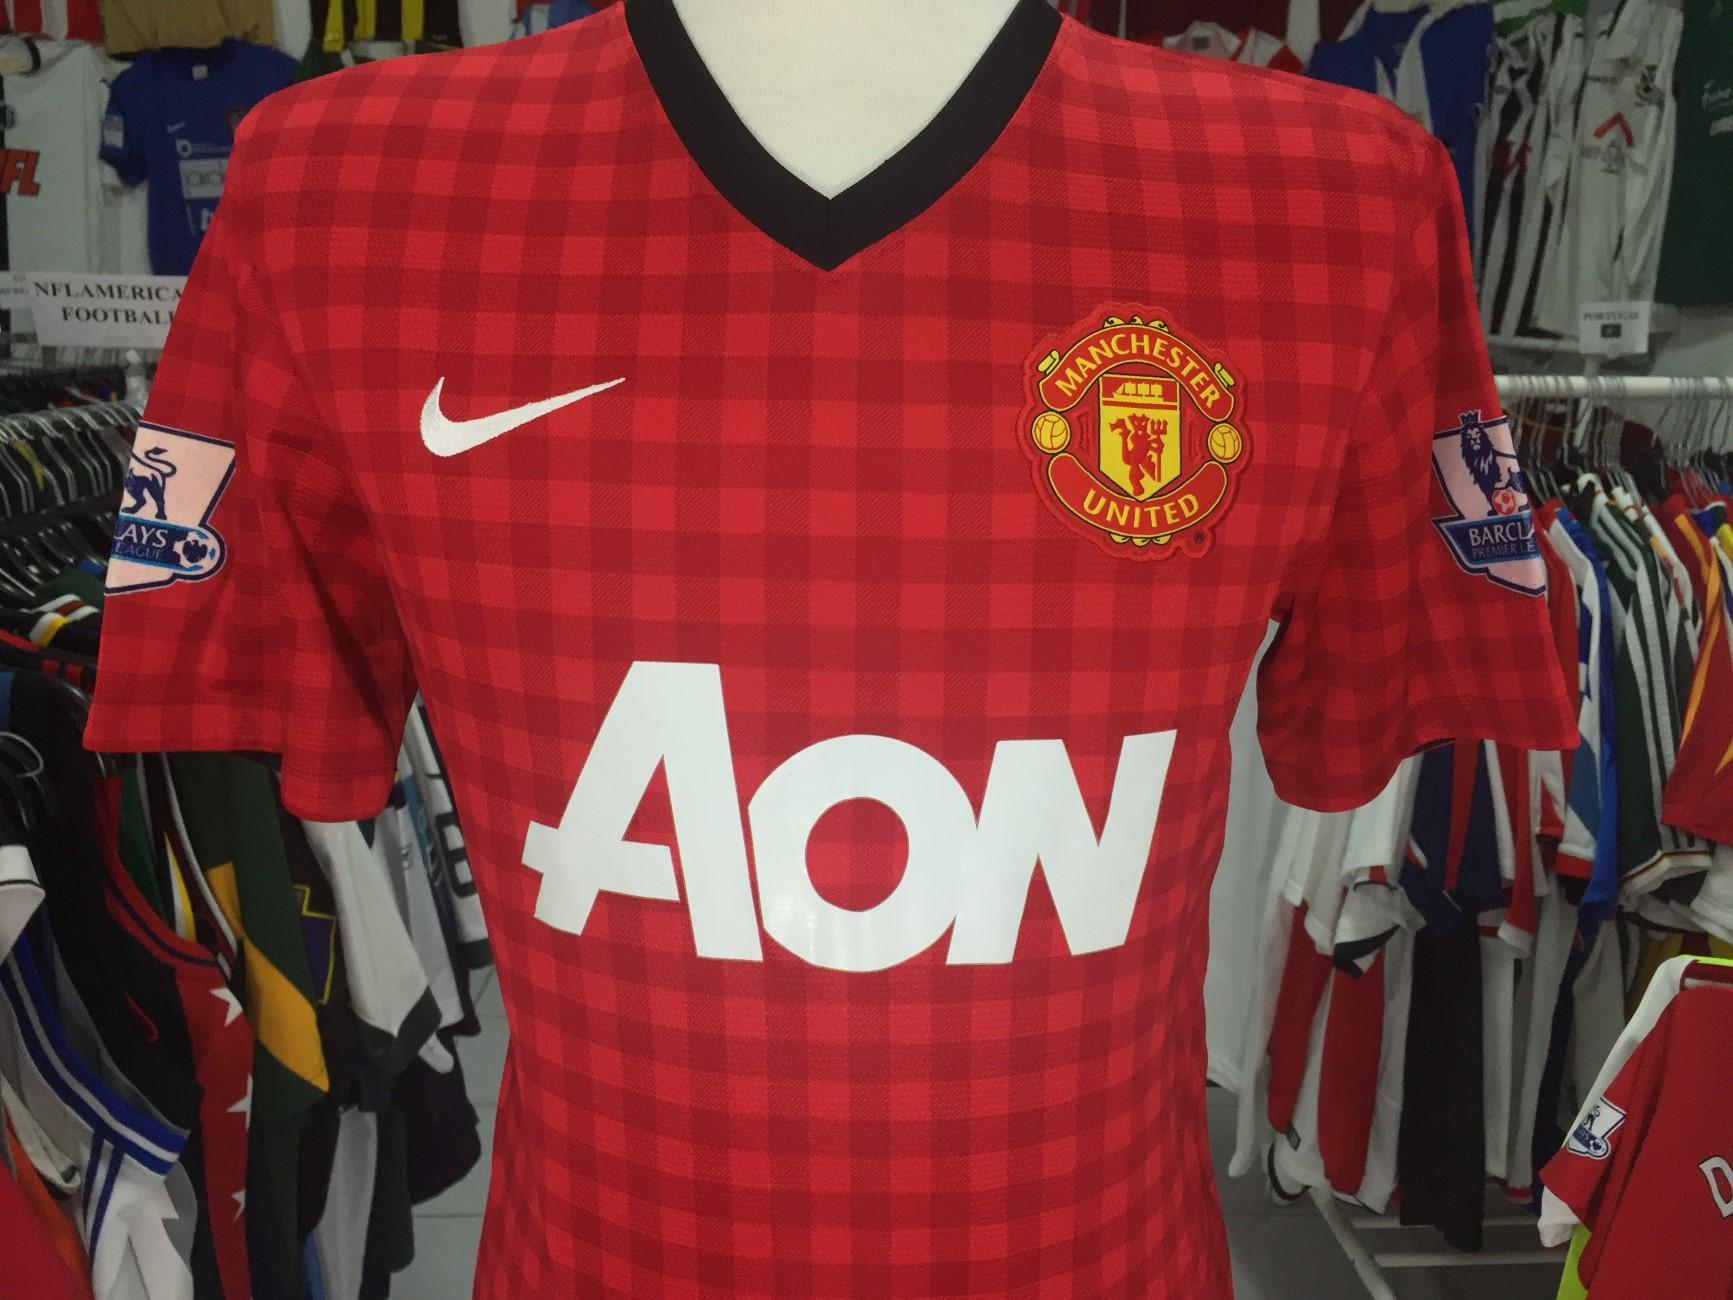 aa4df5535f4 Manchester United Football Shirt 2012 13